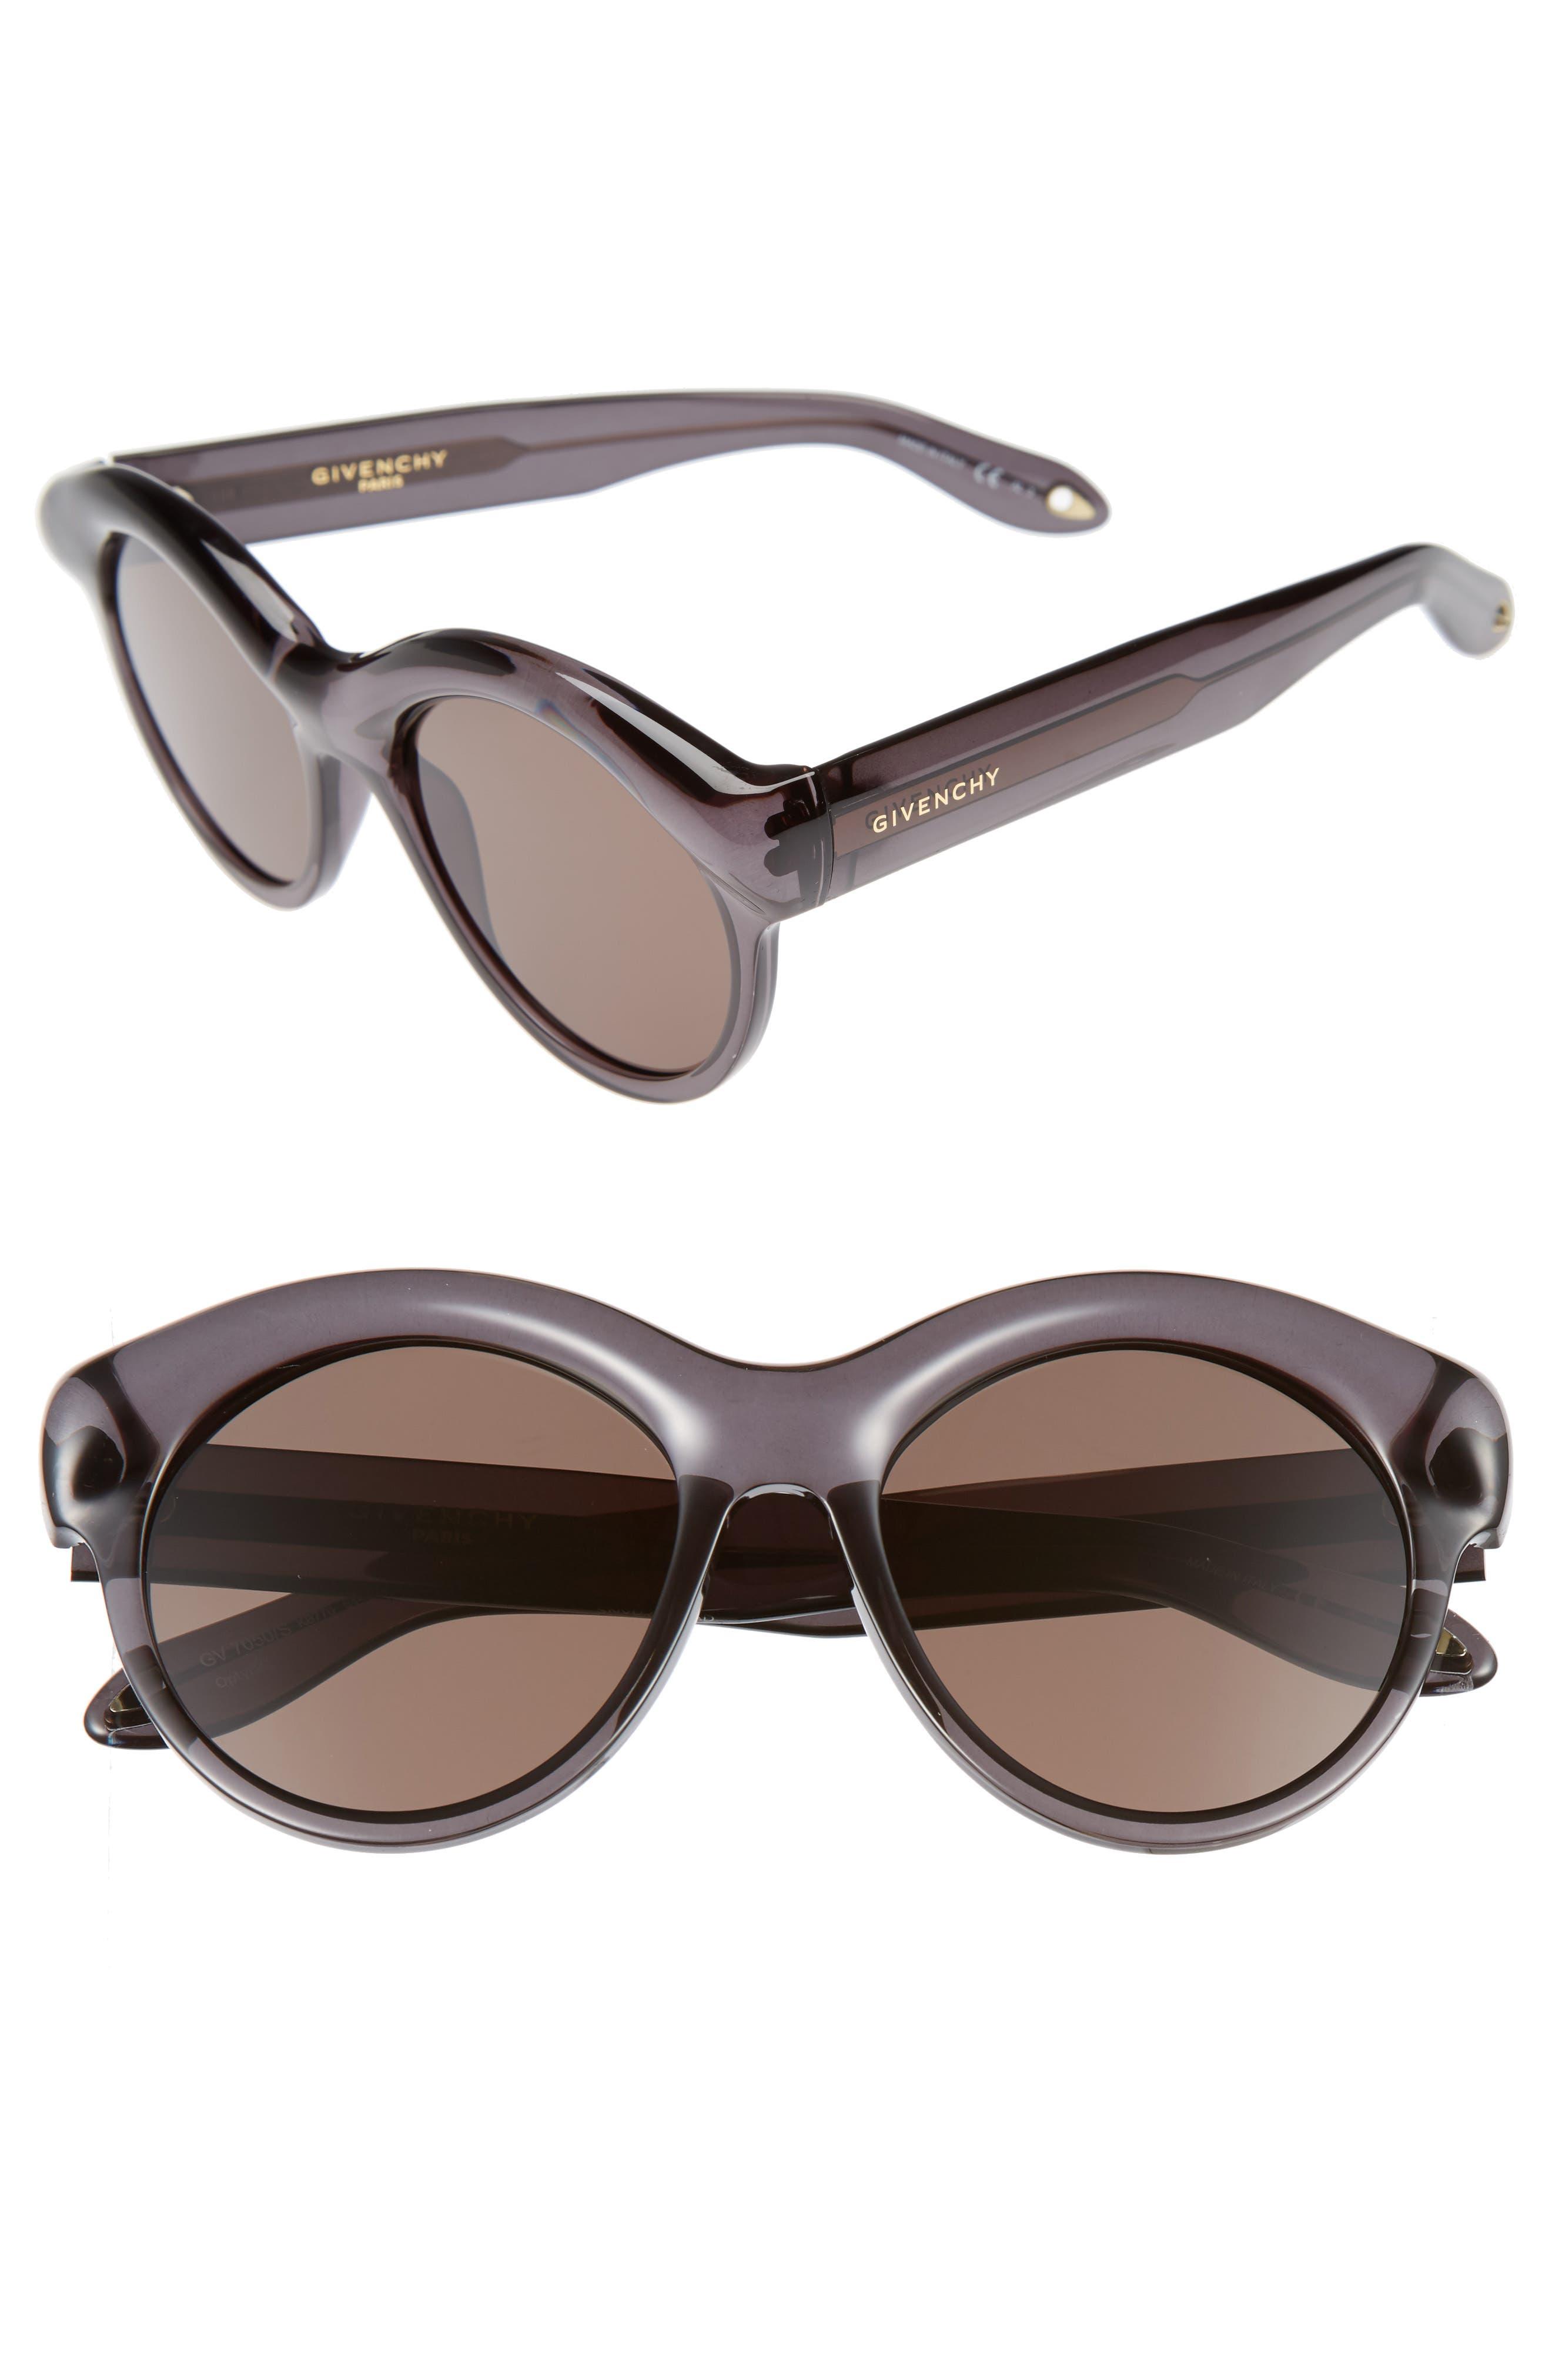 54mm Sunglasses,                         Main,                         color, 020